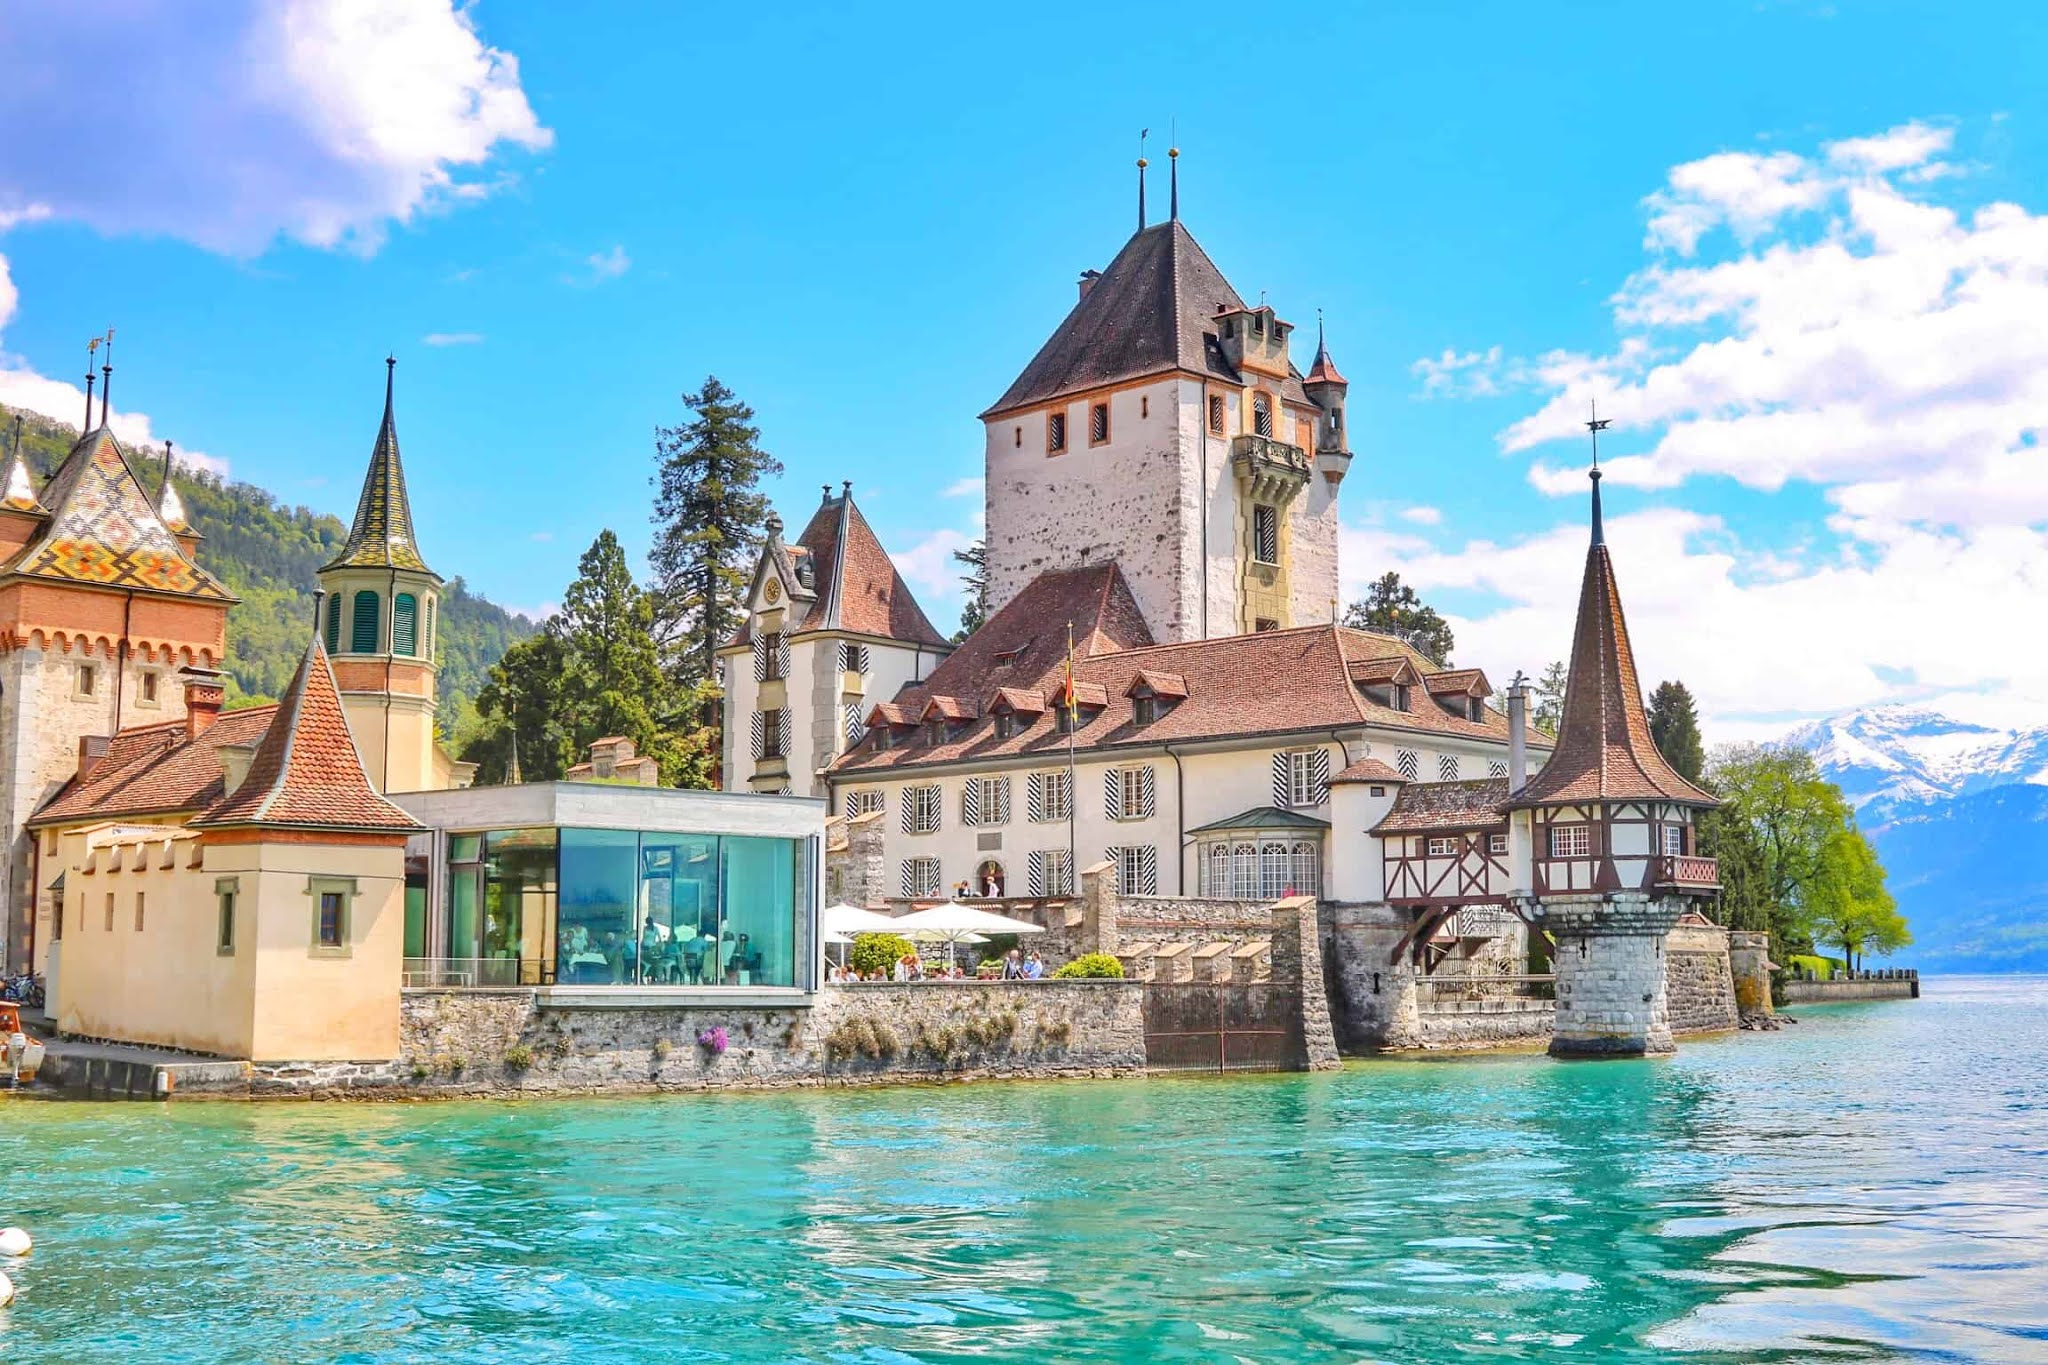 Spiez Castle History 2